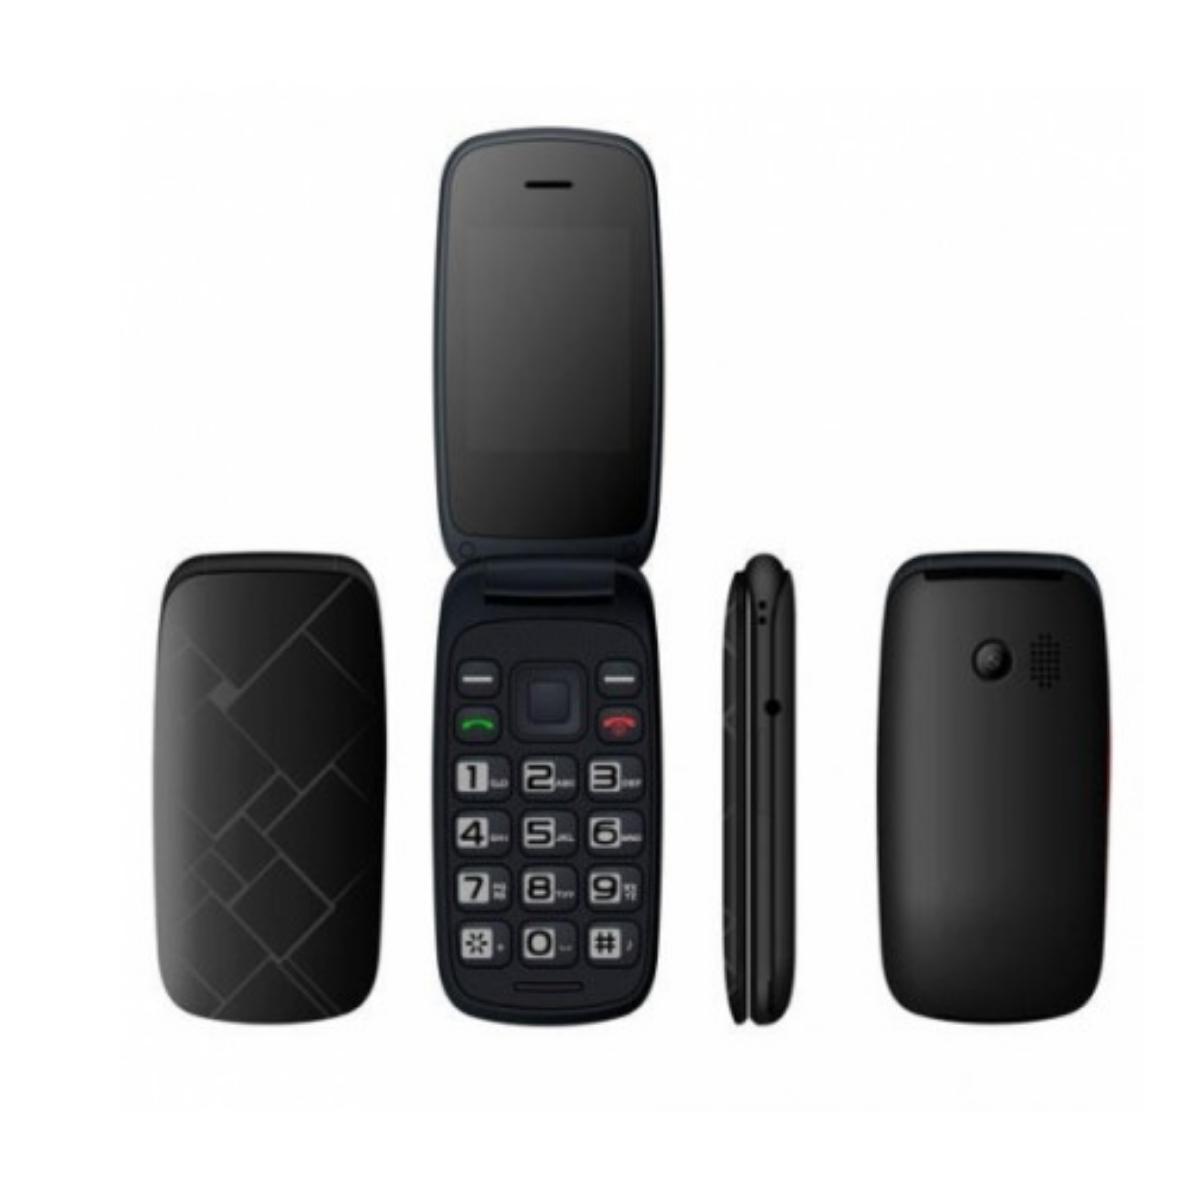 Qubo Teléfono Móvil Neo 2, Dual SIM, Negro + Base de carga